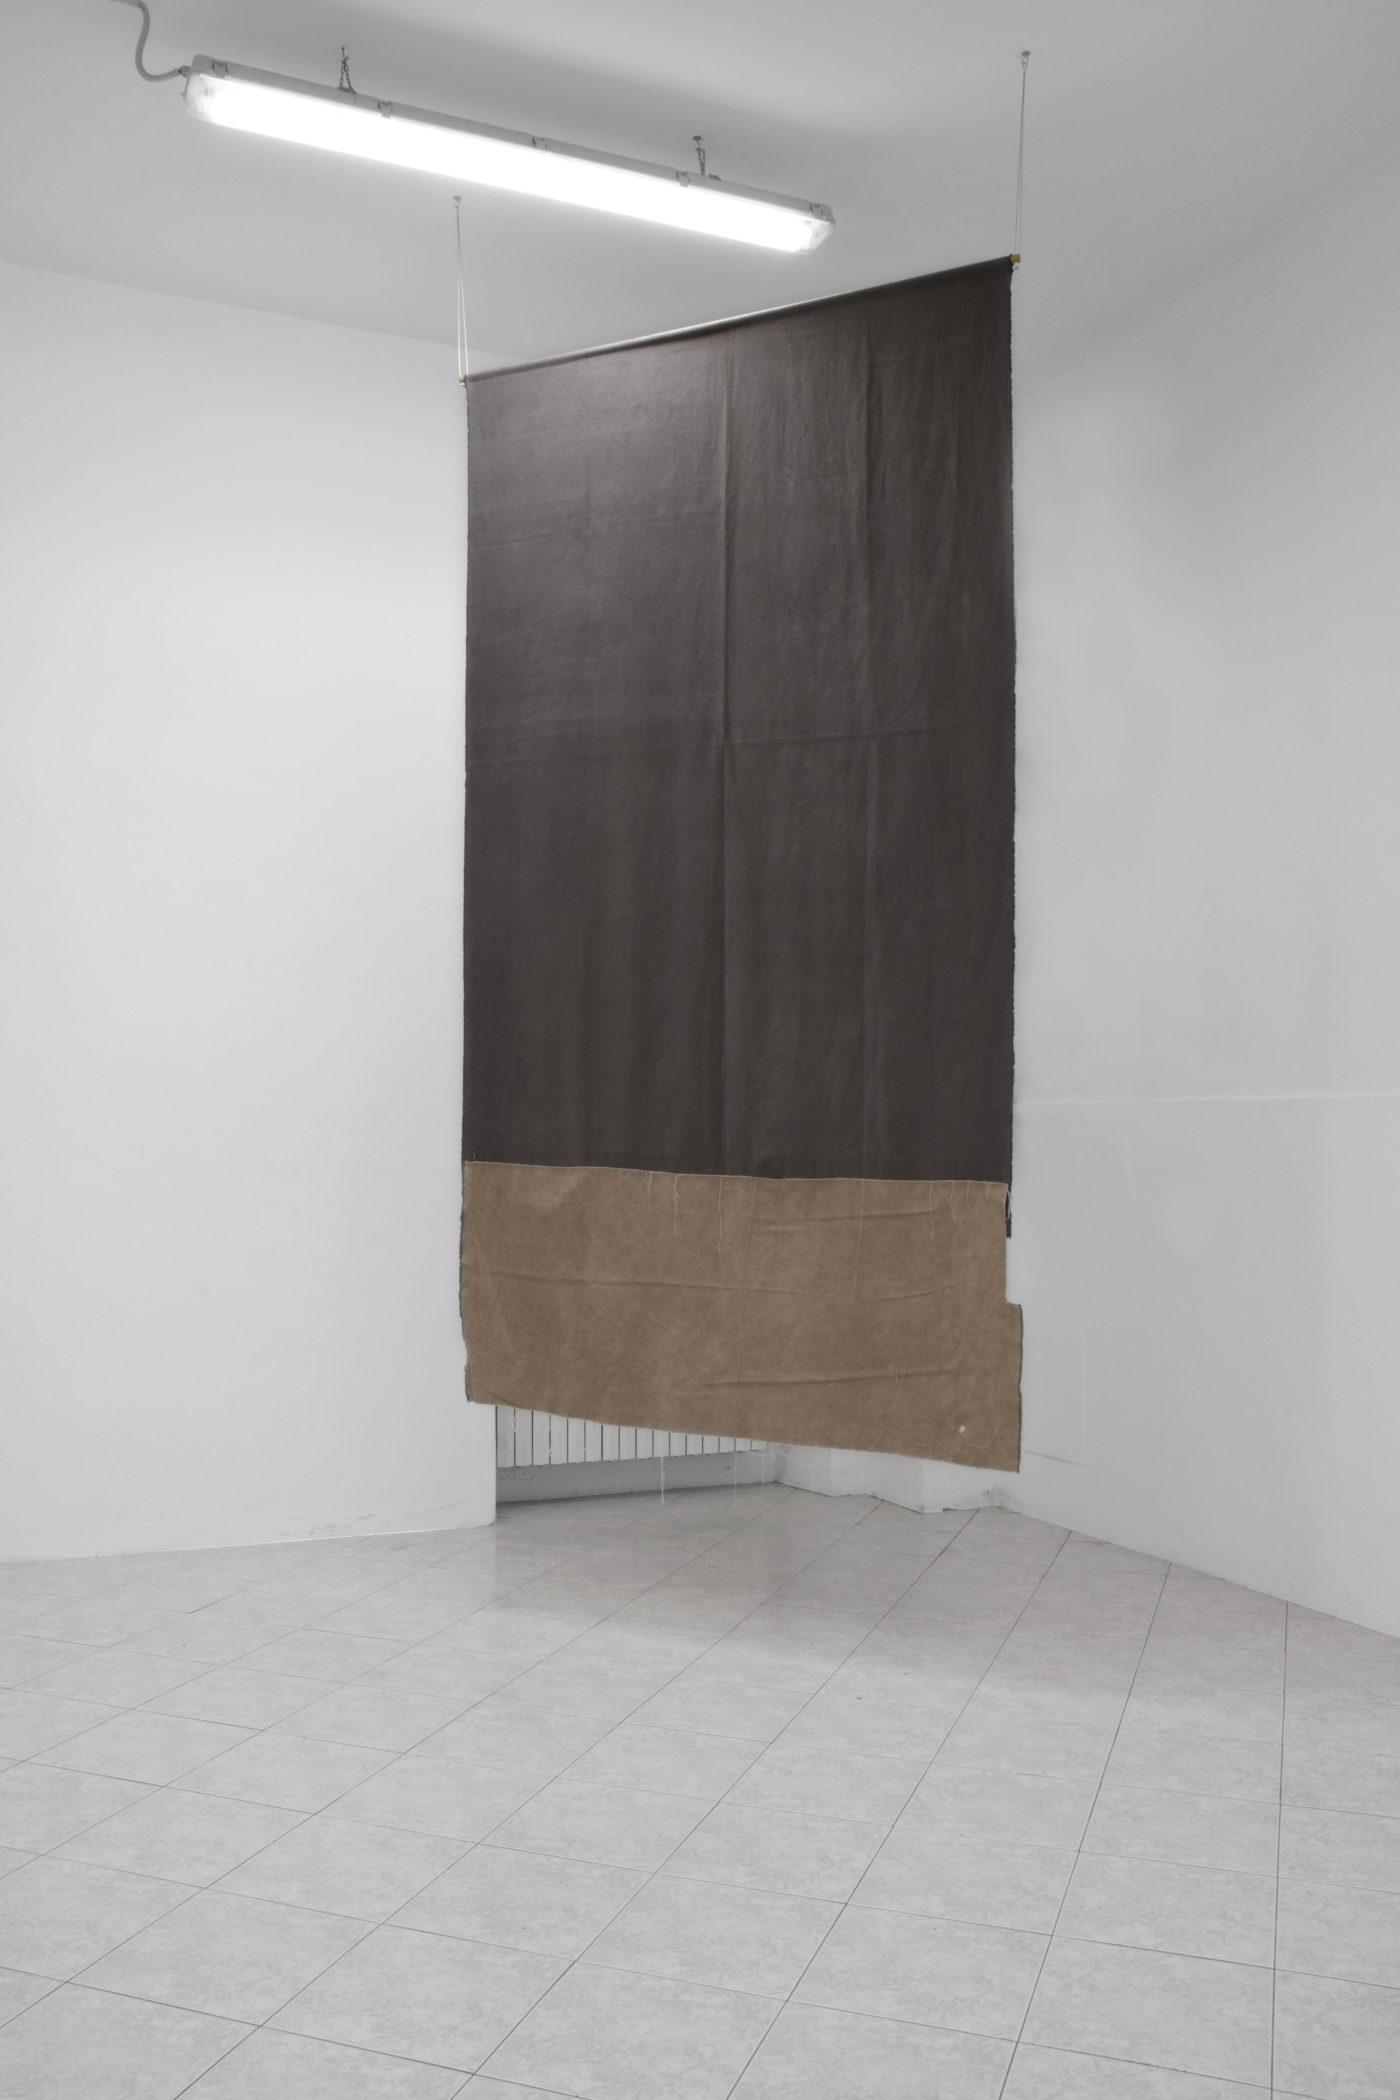 Hermann Bergamelli - Tòtòc. Rehearsal Project, Milano